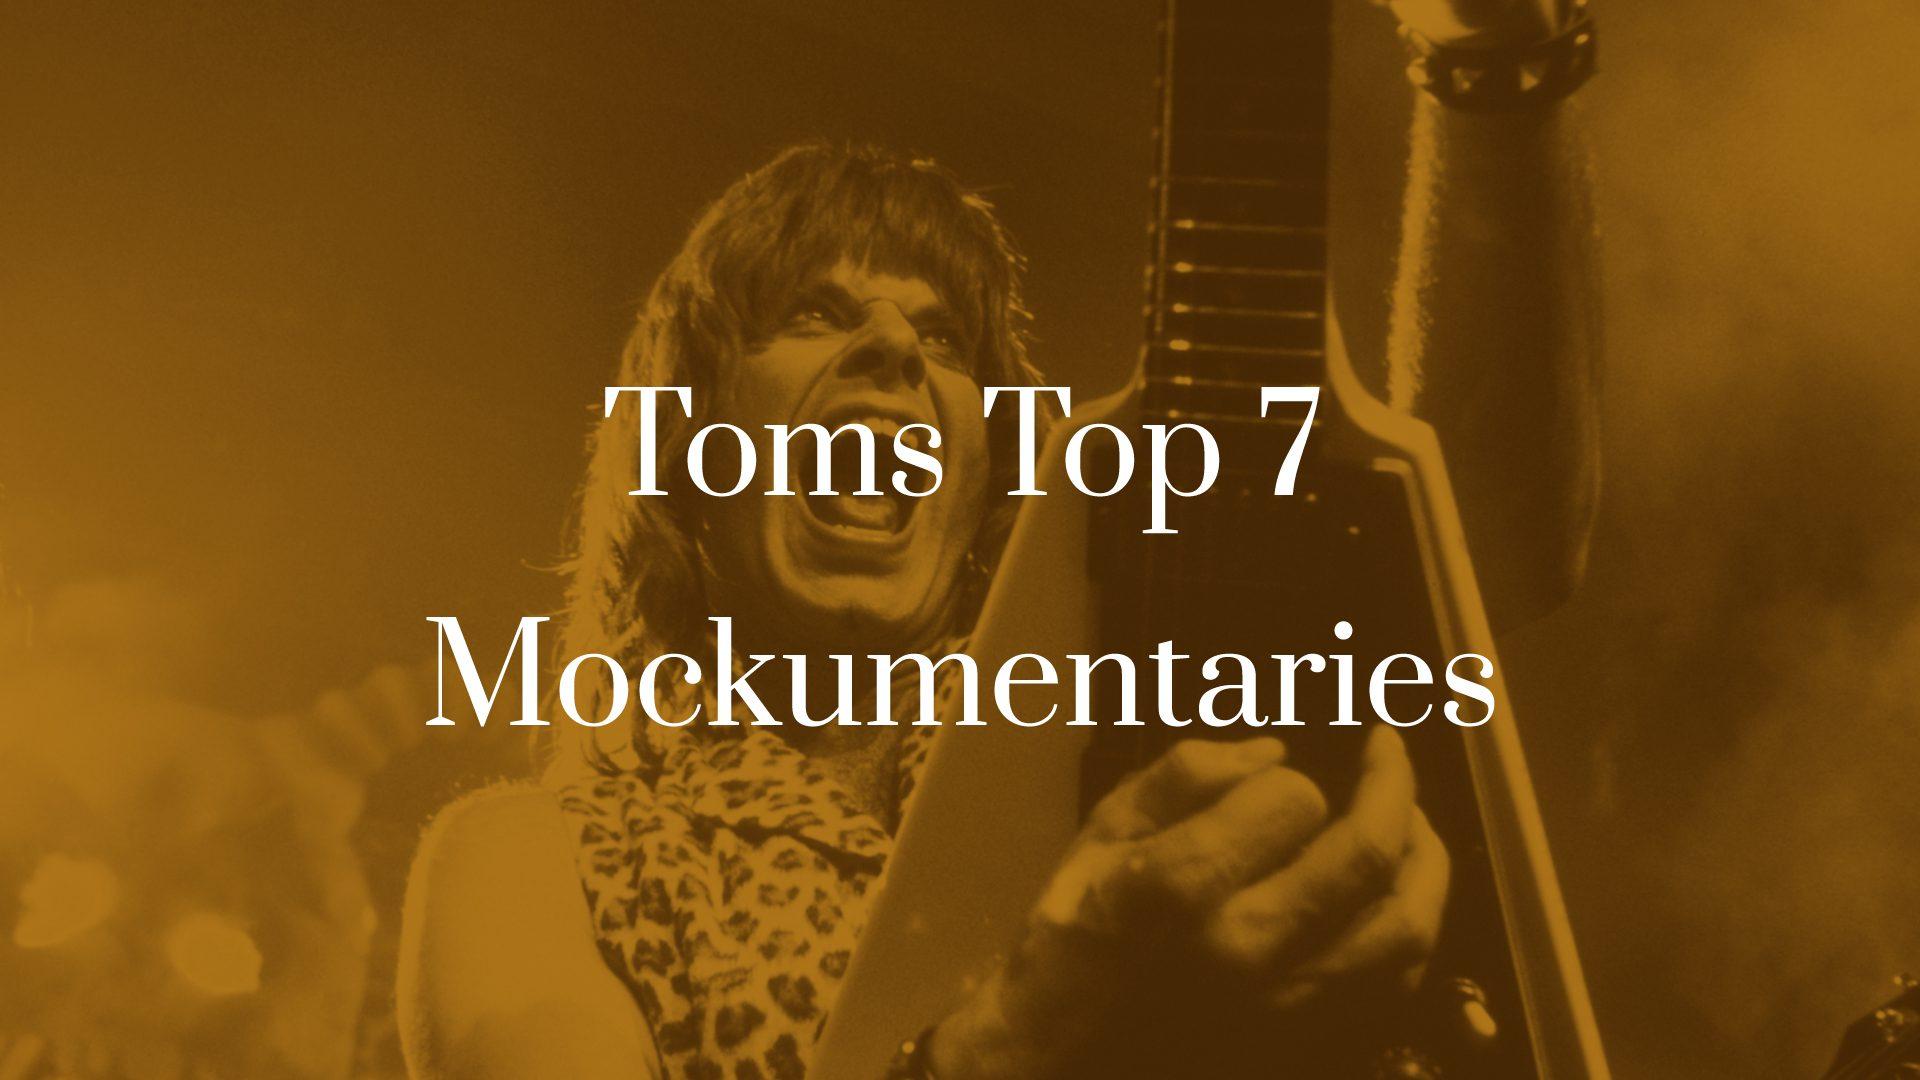 Titelbild für TOMS TOP 7 Mockumentaries